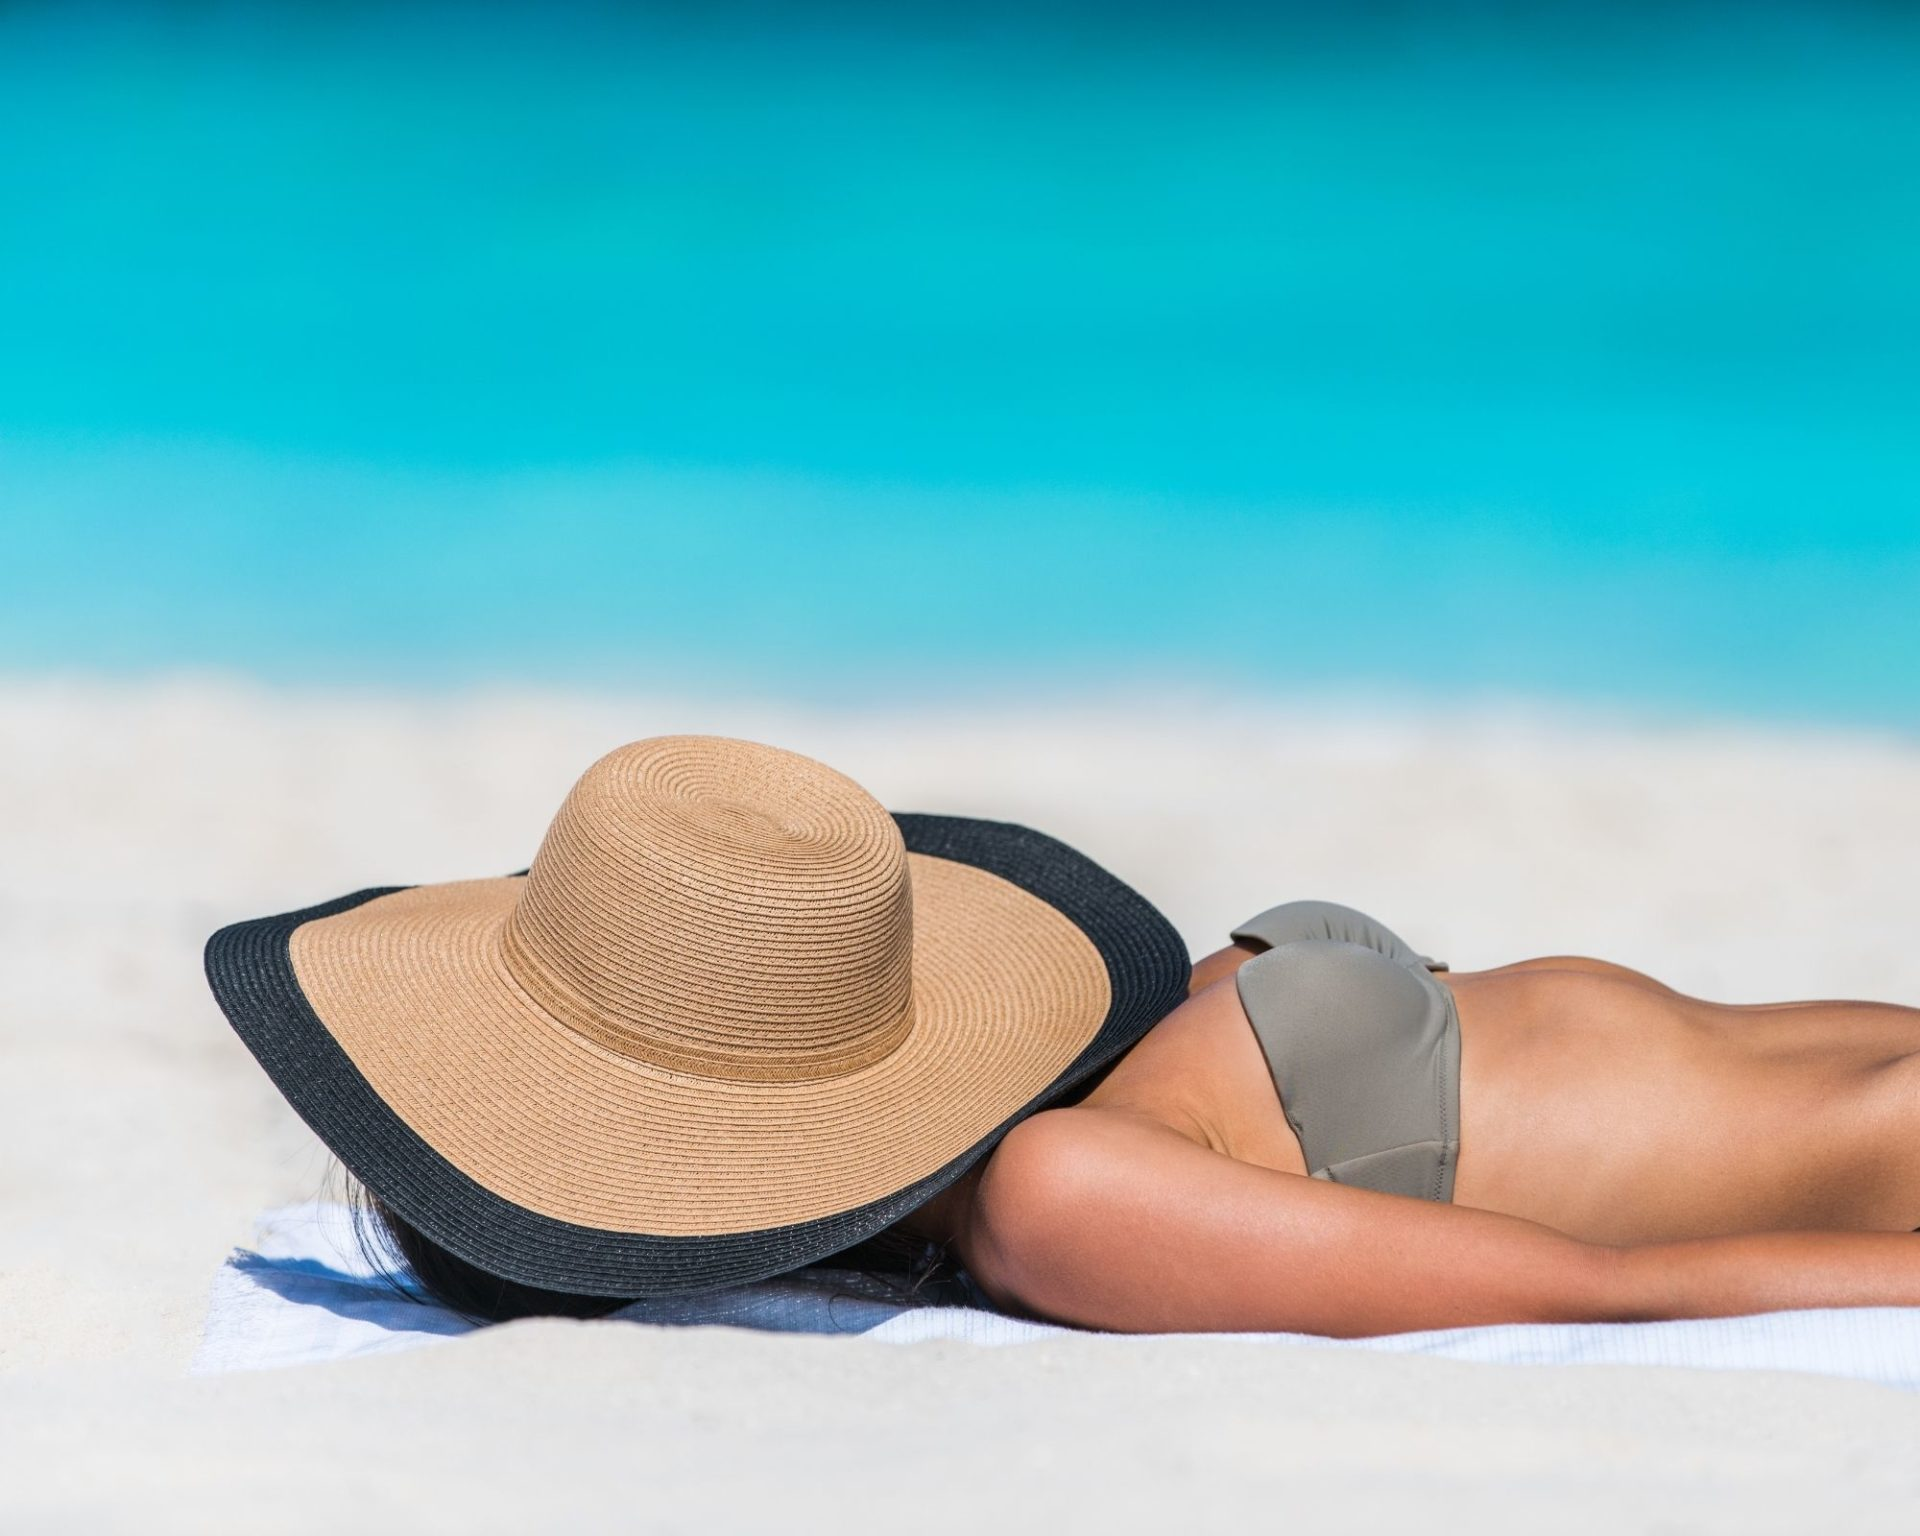 golden sands on the beach - sleep in on sundays